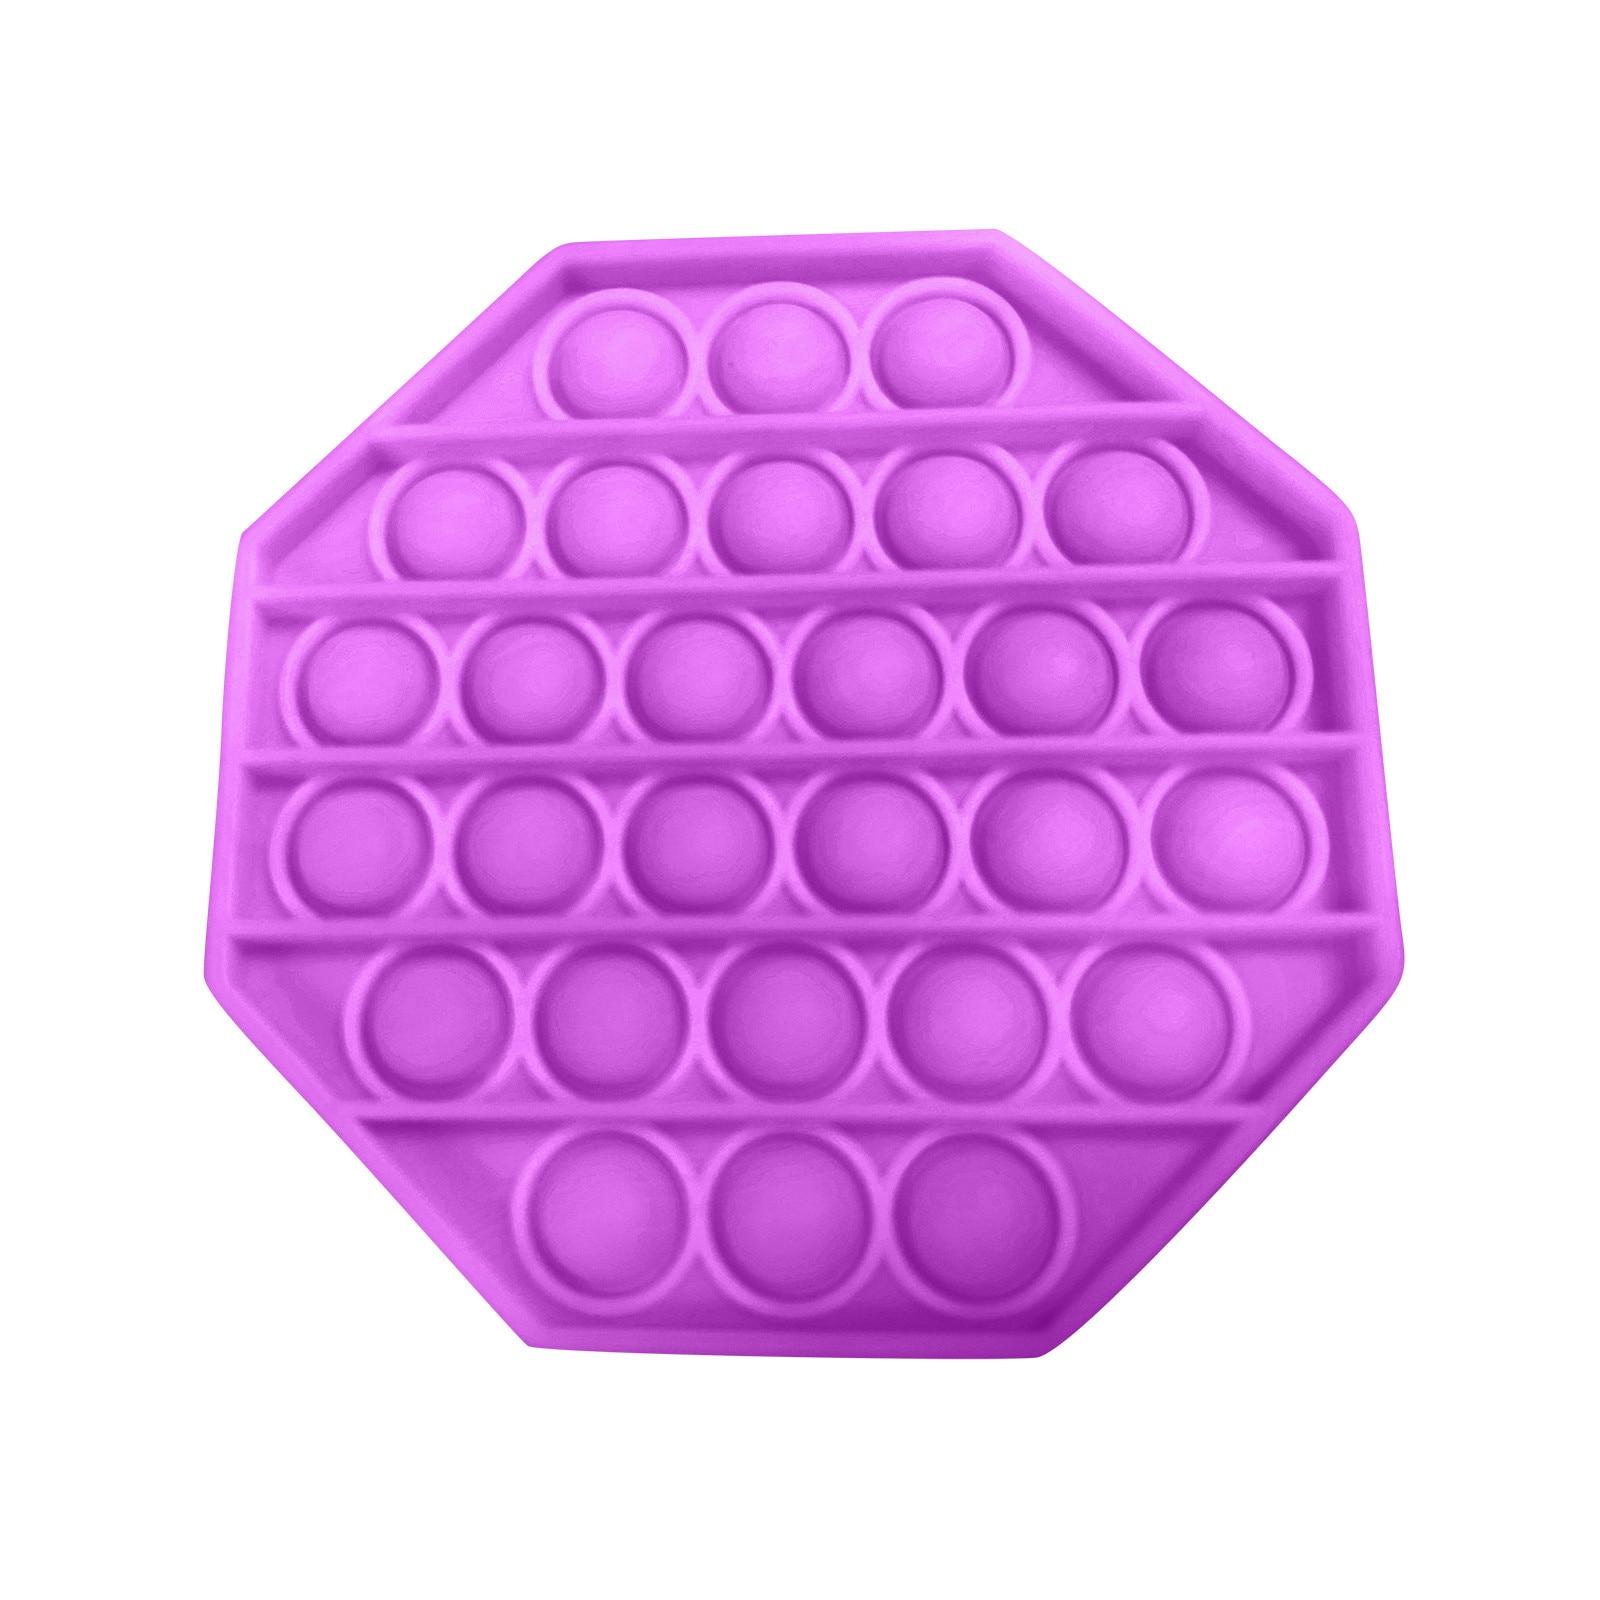 Toy Fidget-Toys Sensory-Toy Needs-Stress Push Bubble Popit Special Kids Simple Dimple img3